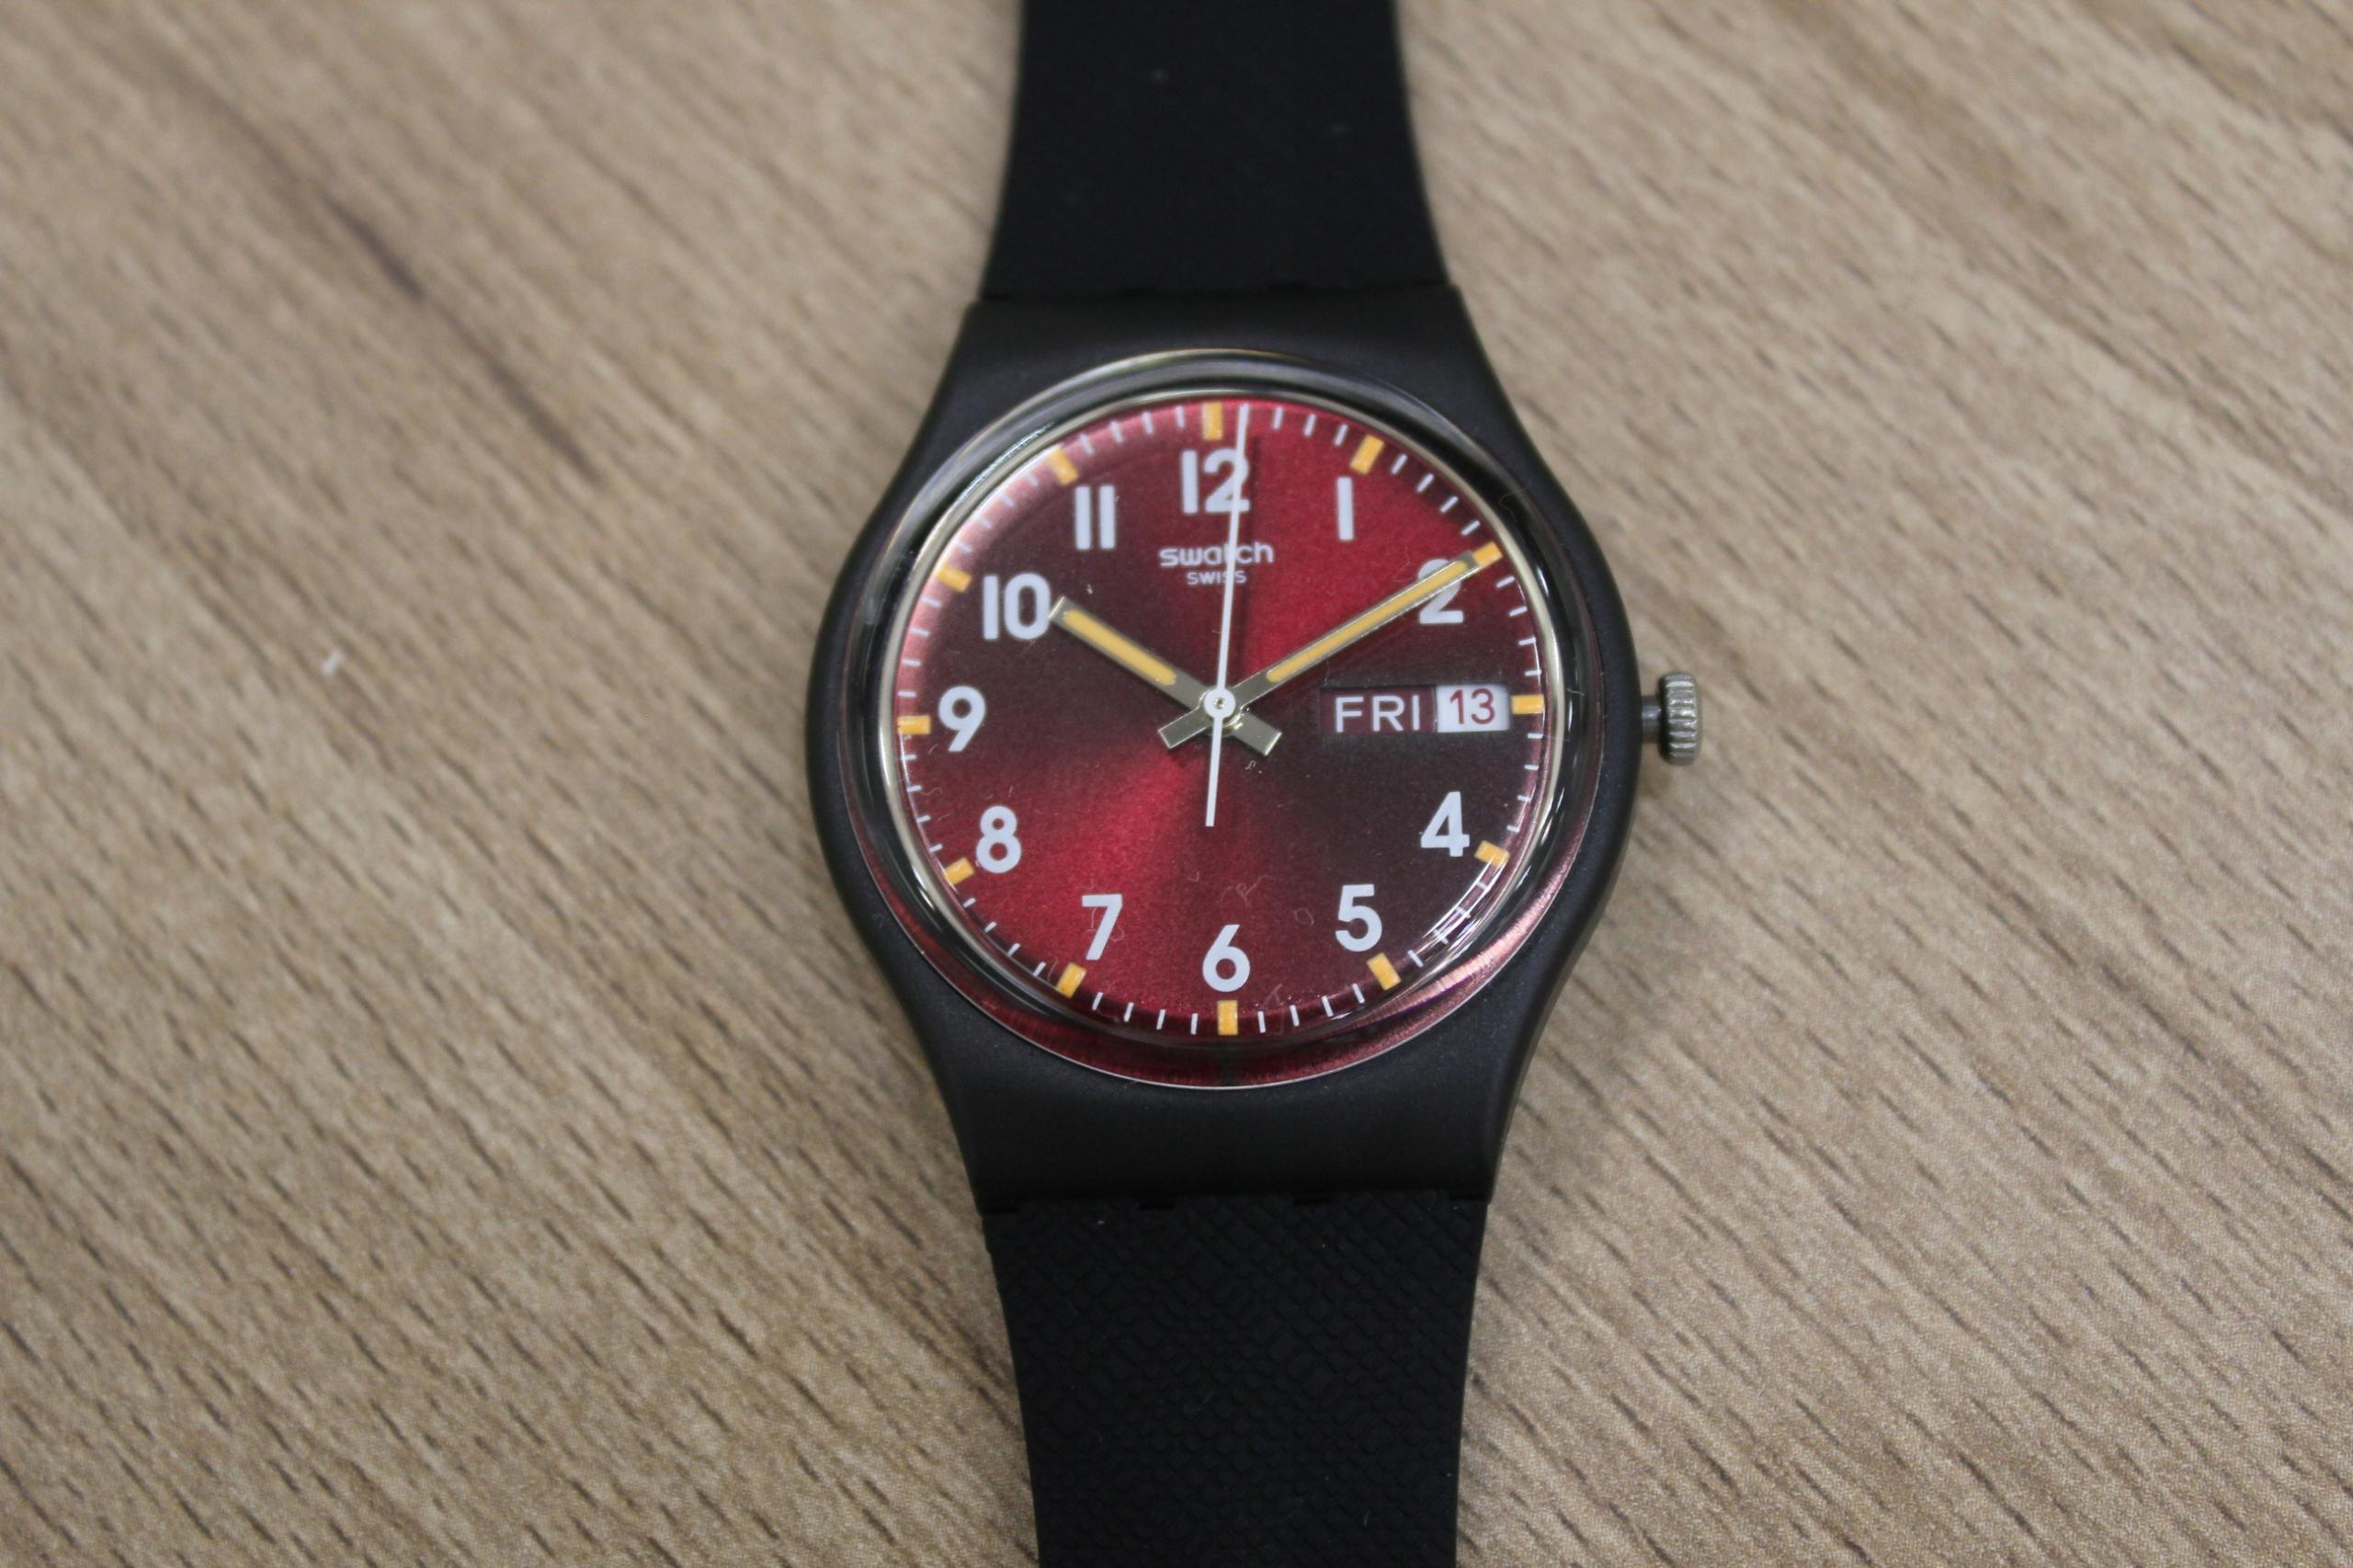 Zegarek Swatch GB 753 Lombard4u M1